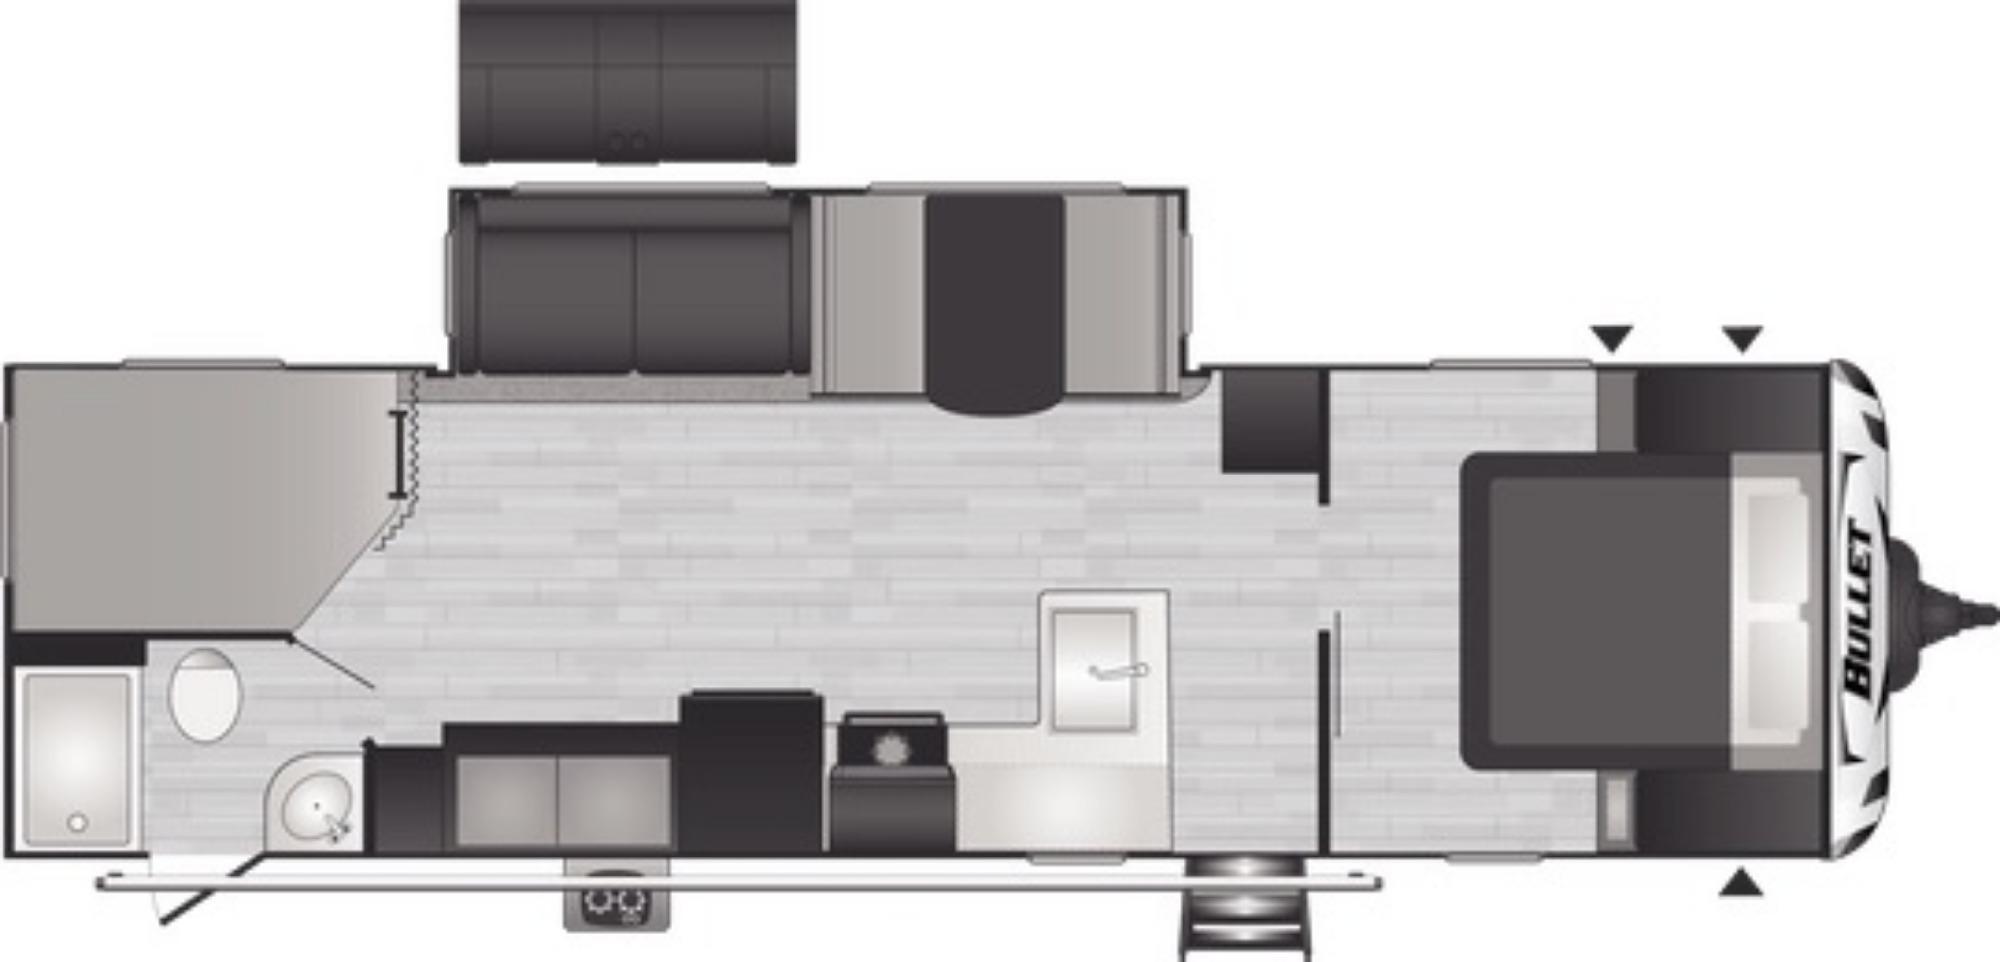 View Floor Plan for 2022 KEYSTONE BULLET 290BHS